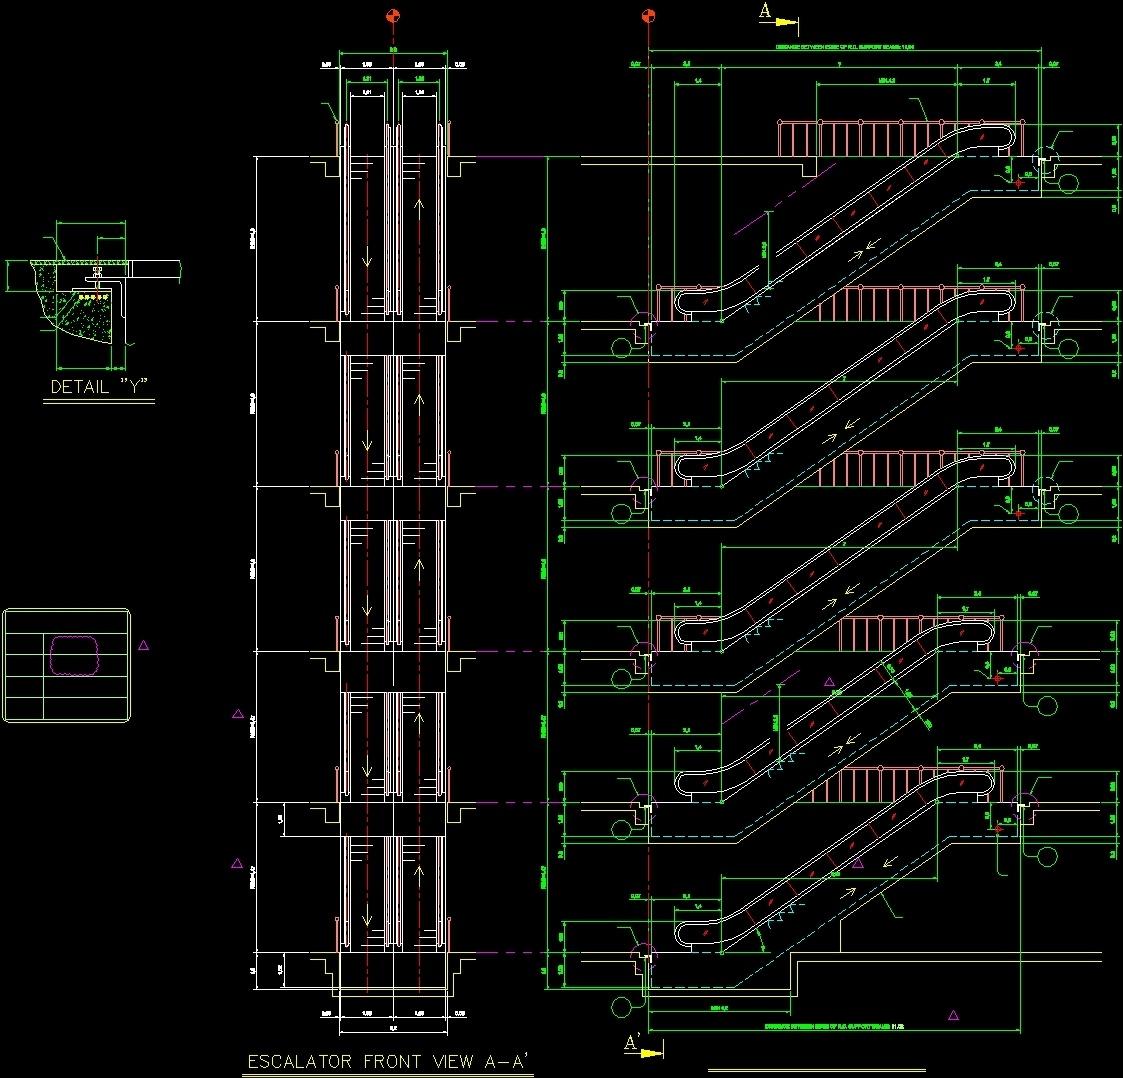 Escalator 35 Dwg Detail For Autocad Designs Cad Schematic Additional Screenshots